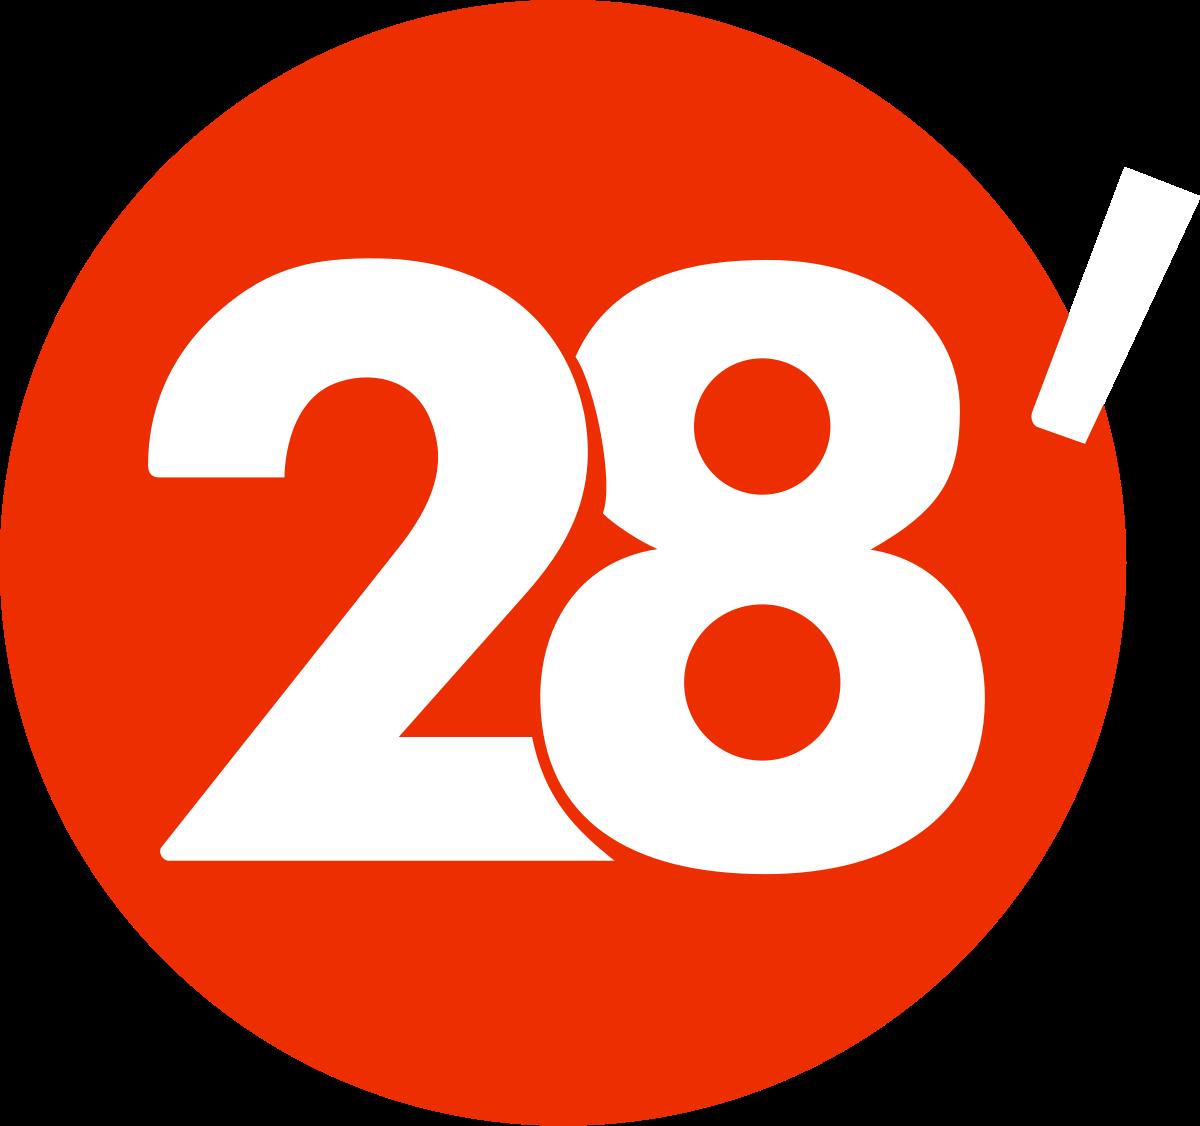 logo 28 minutes